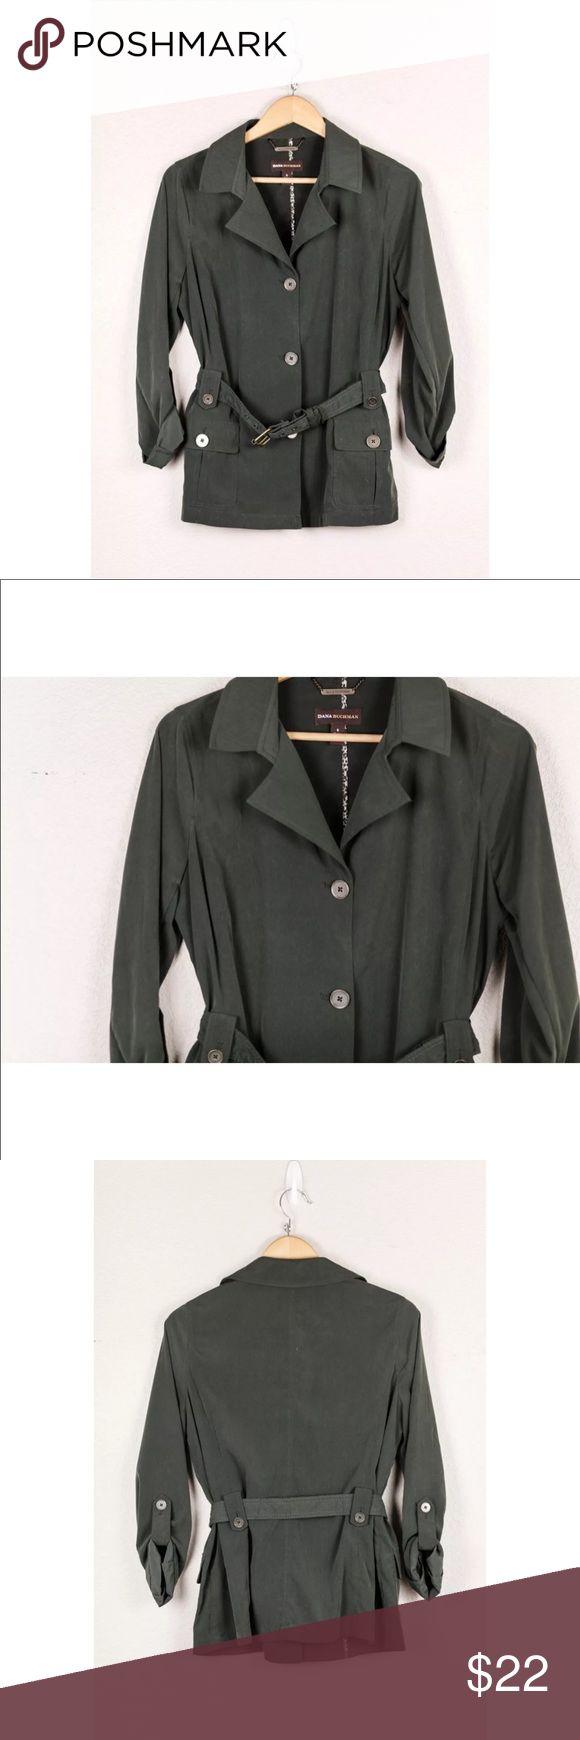 Dana Buchman Olive Green Lightweight Safari Jacket Dana Buchman Women's Olive Green Lightweight Safari Blazer Belted Jacket Small S Dana Buchman Jackets & Coats